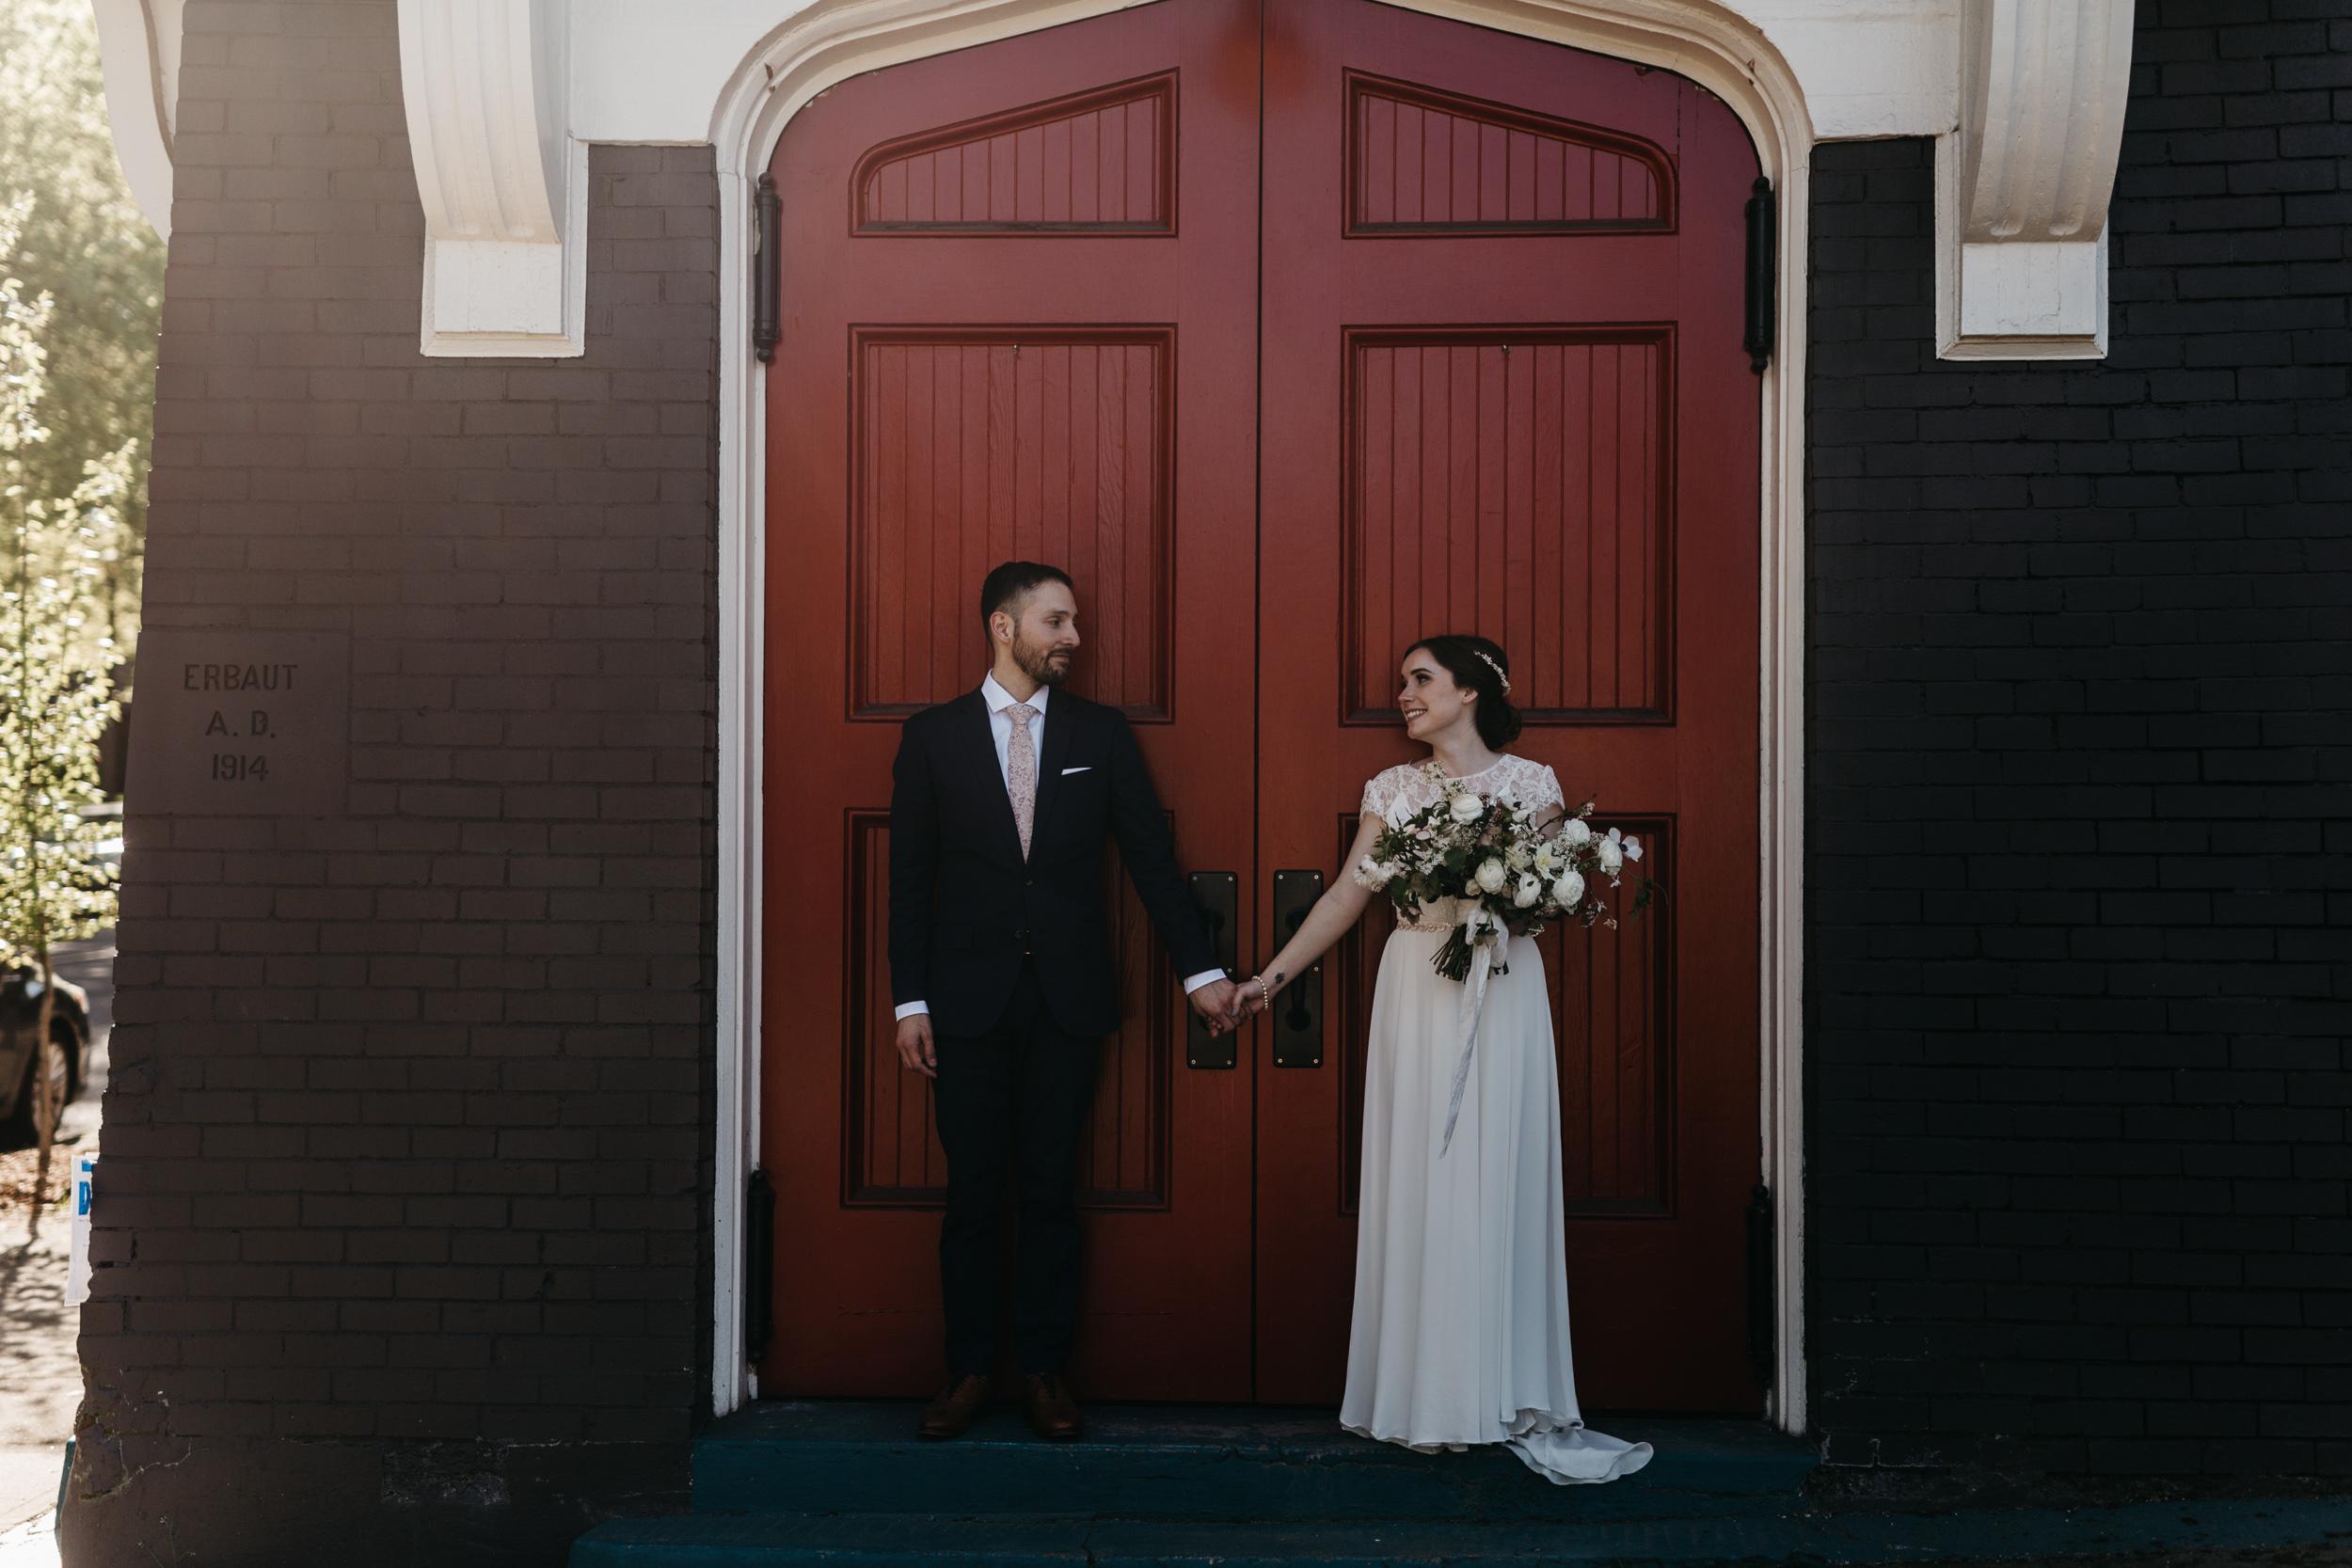 door-of-hope-wedding-portland-artistic-wedding-photography-2128.jpg